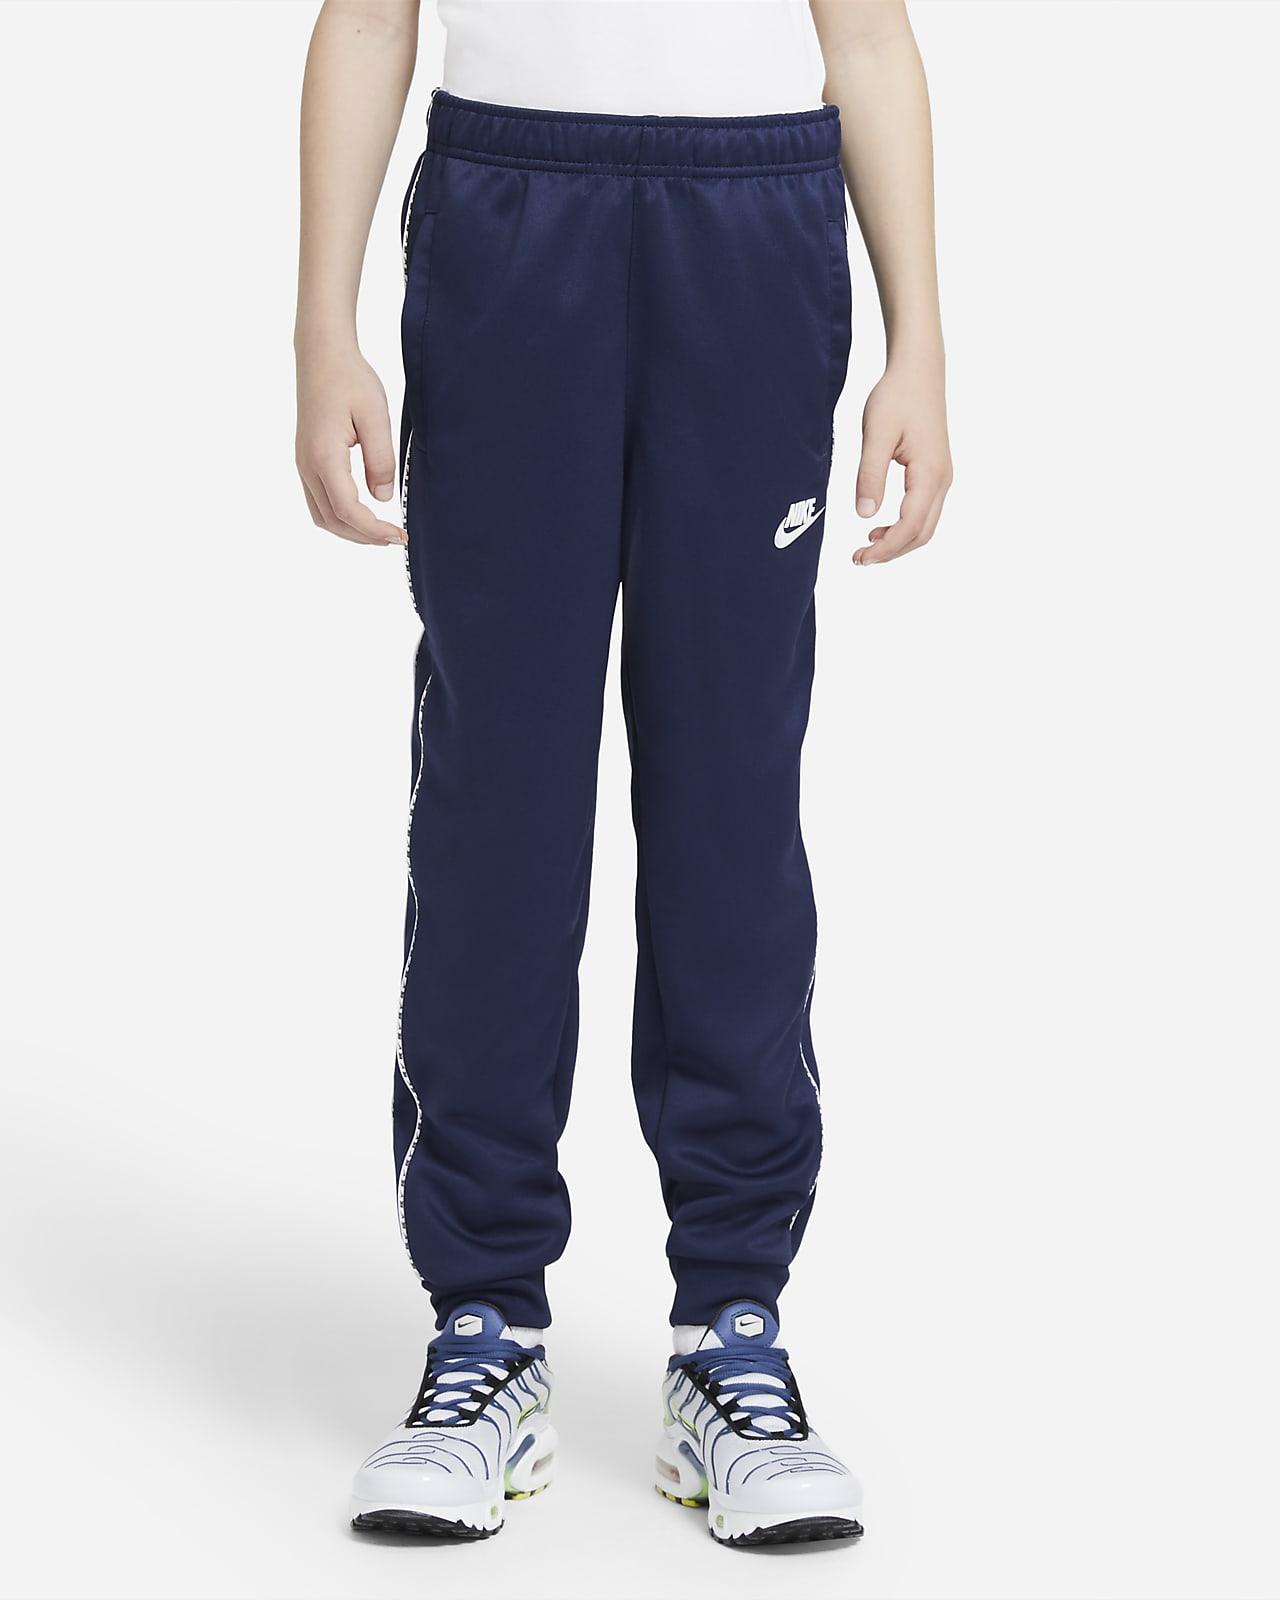 Pantalon de jogging Nike Sportswear pour Garçon plus âgé